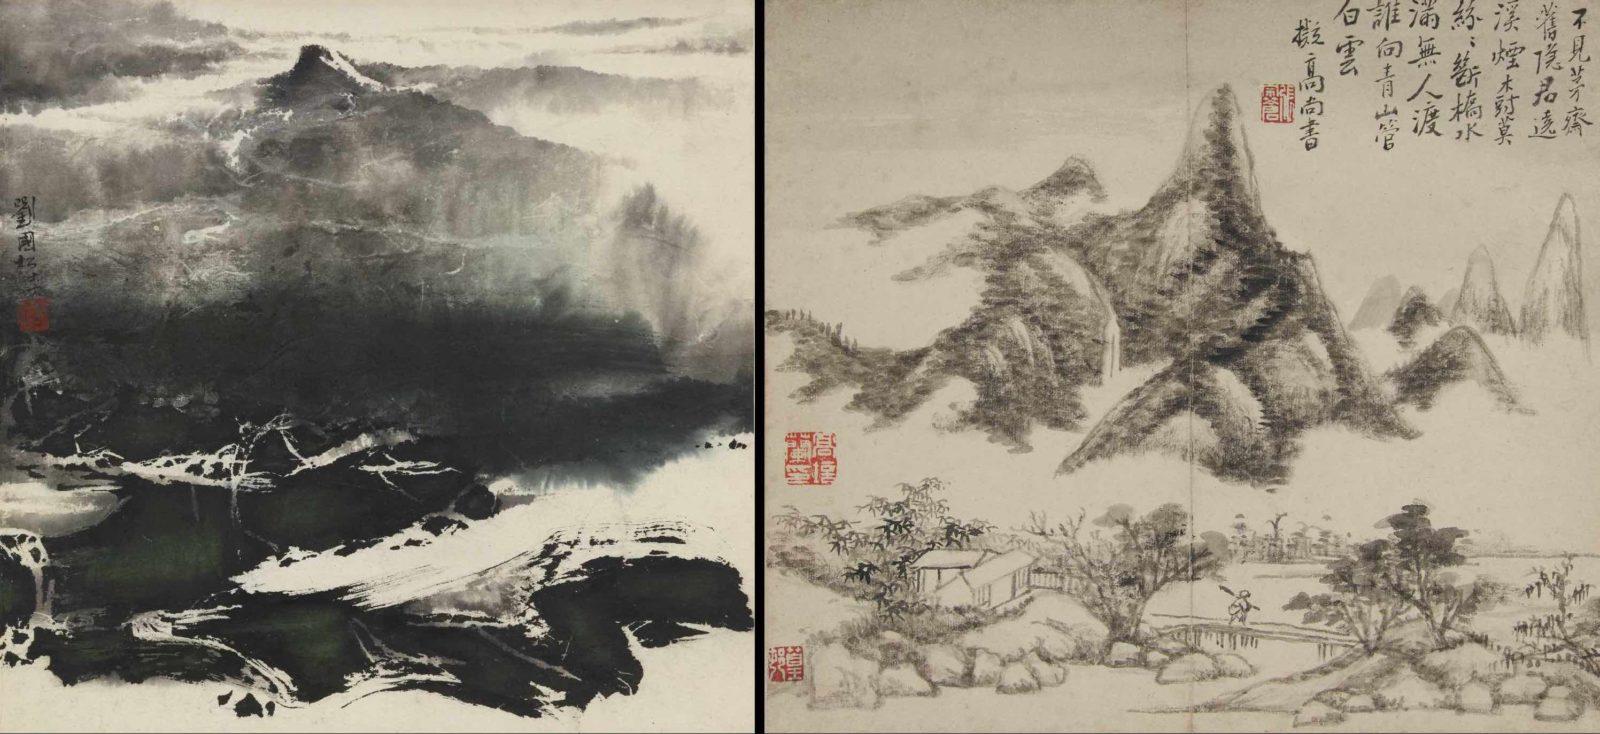 Liu Guosong (né 1932), Snow, daté 1967